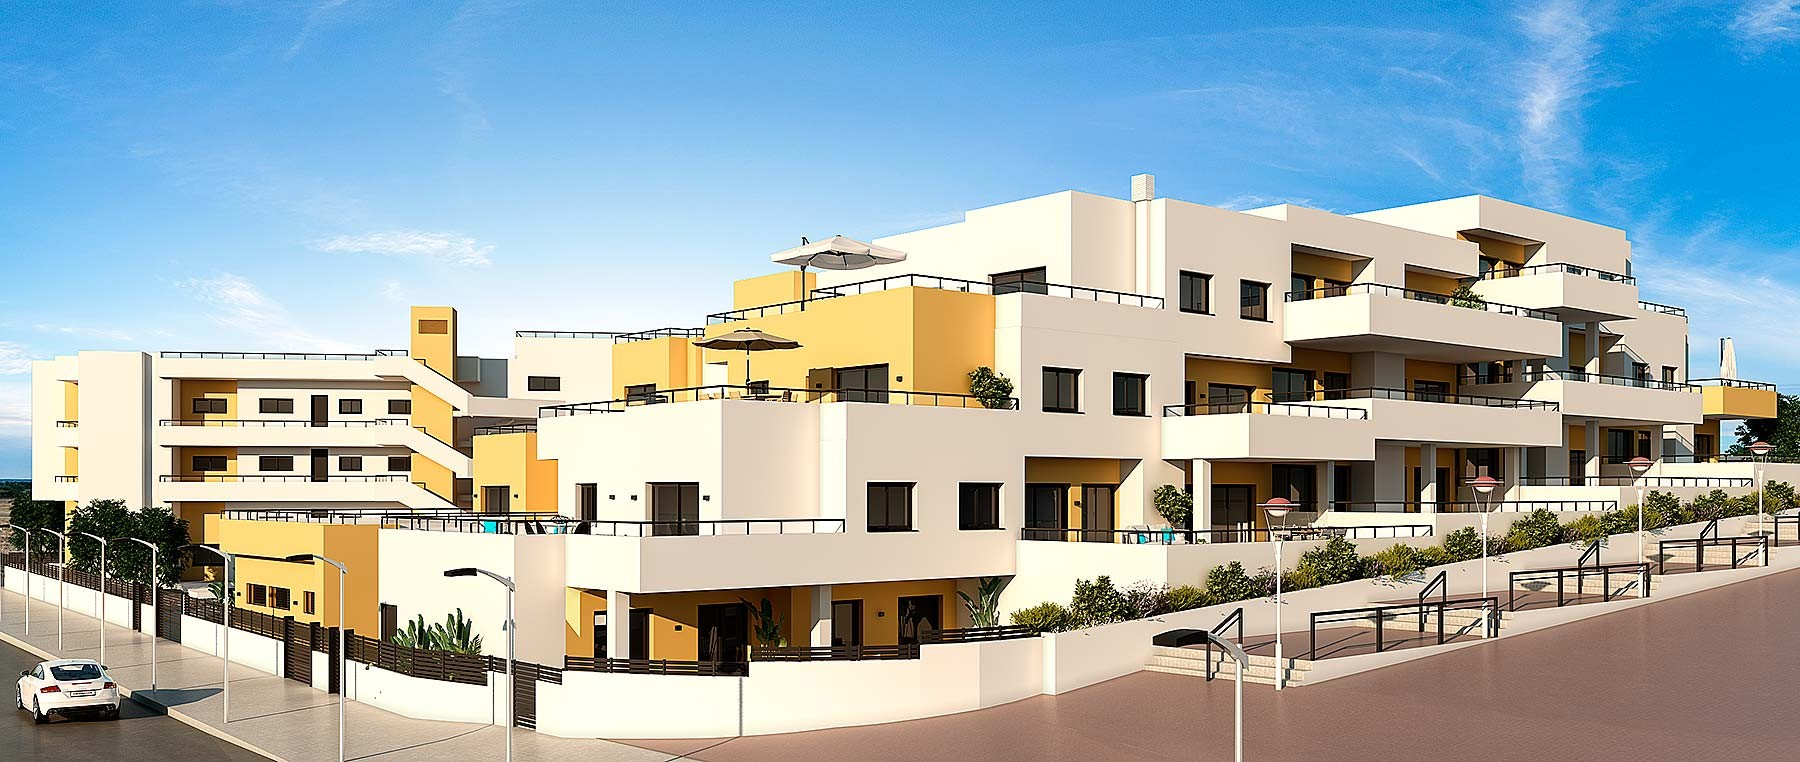 Апартаменты в Гуардамар-дель-Сегура